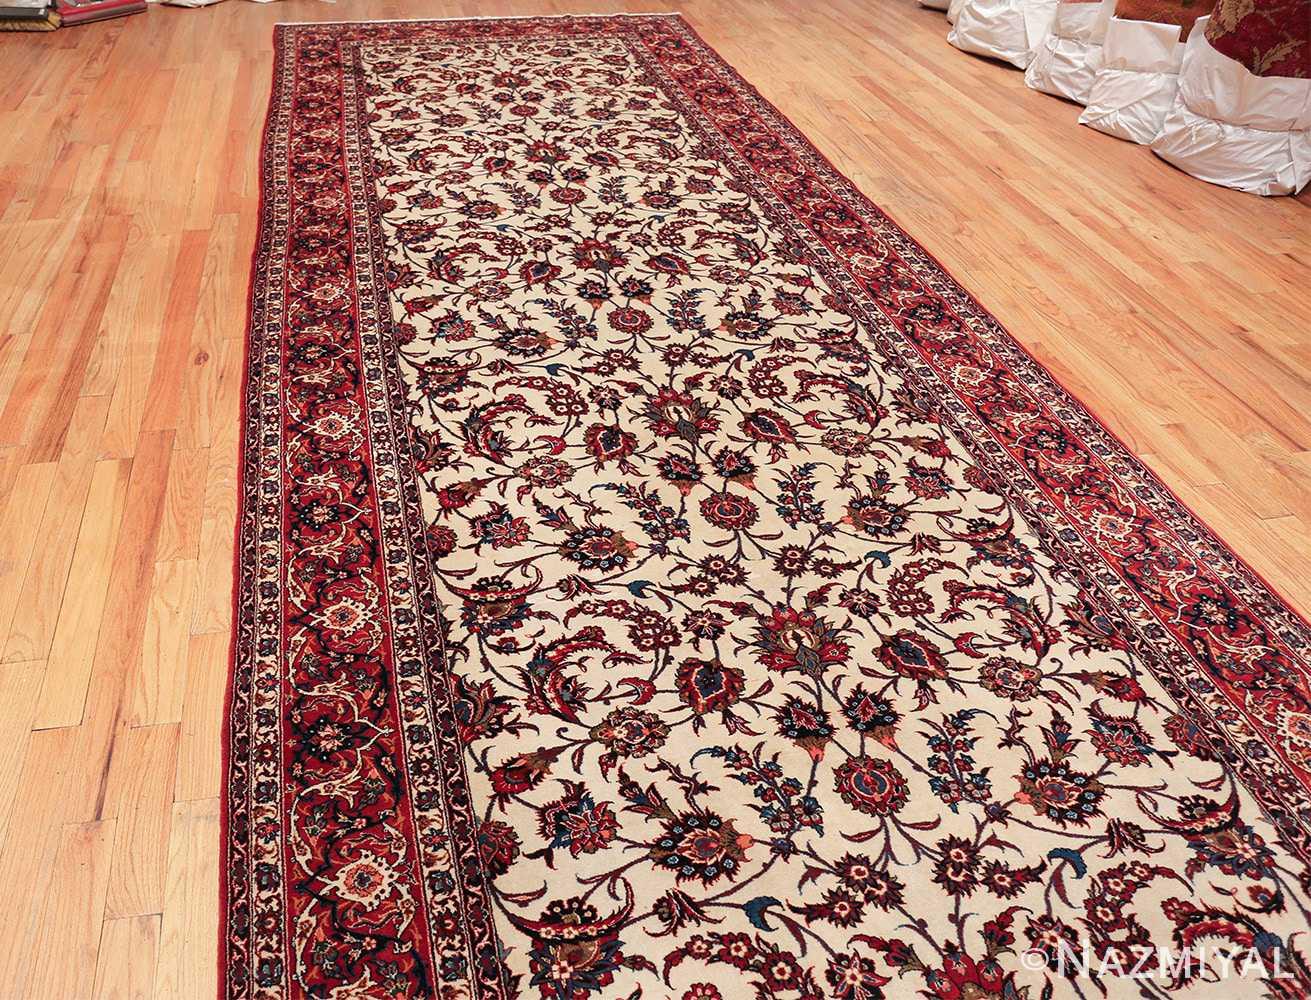 antique wide hallway gallery size persian isfahan rug 60045 knots Nazmiyal